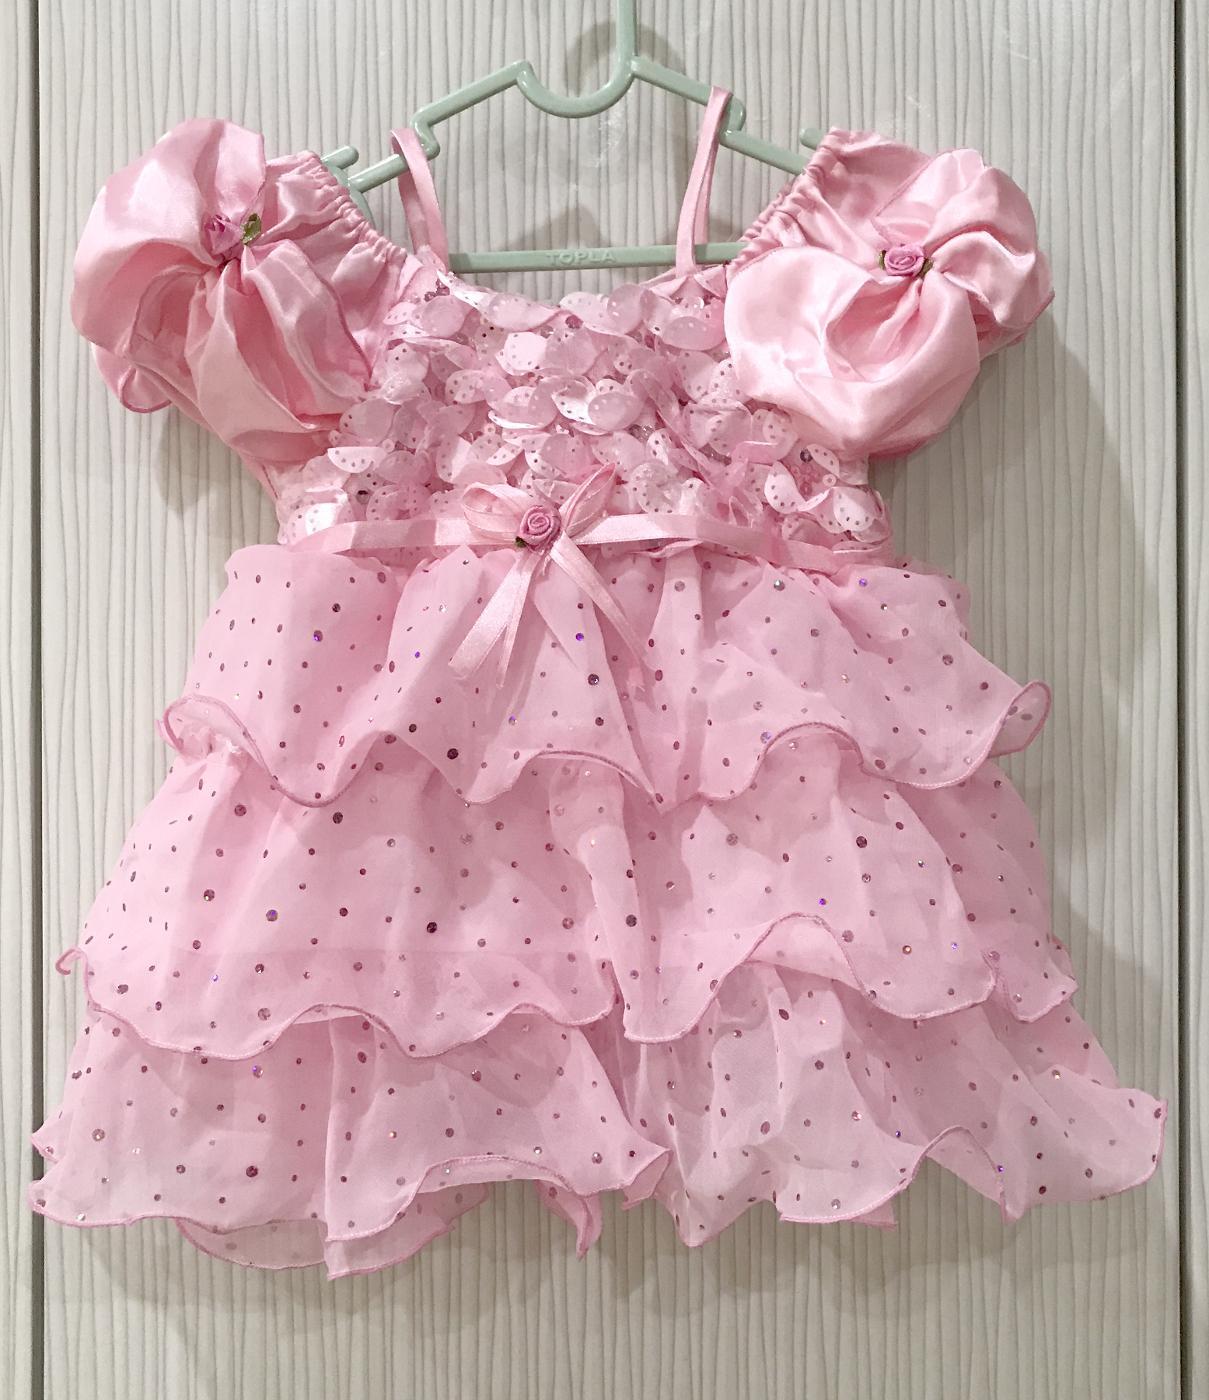 BAYIe - Baju Bayi Pesta Anak Perempuan model Tali Pundak umur 1 - 2 tahun PANCA INDAH/Dress Gaun Pesta anak cewek